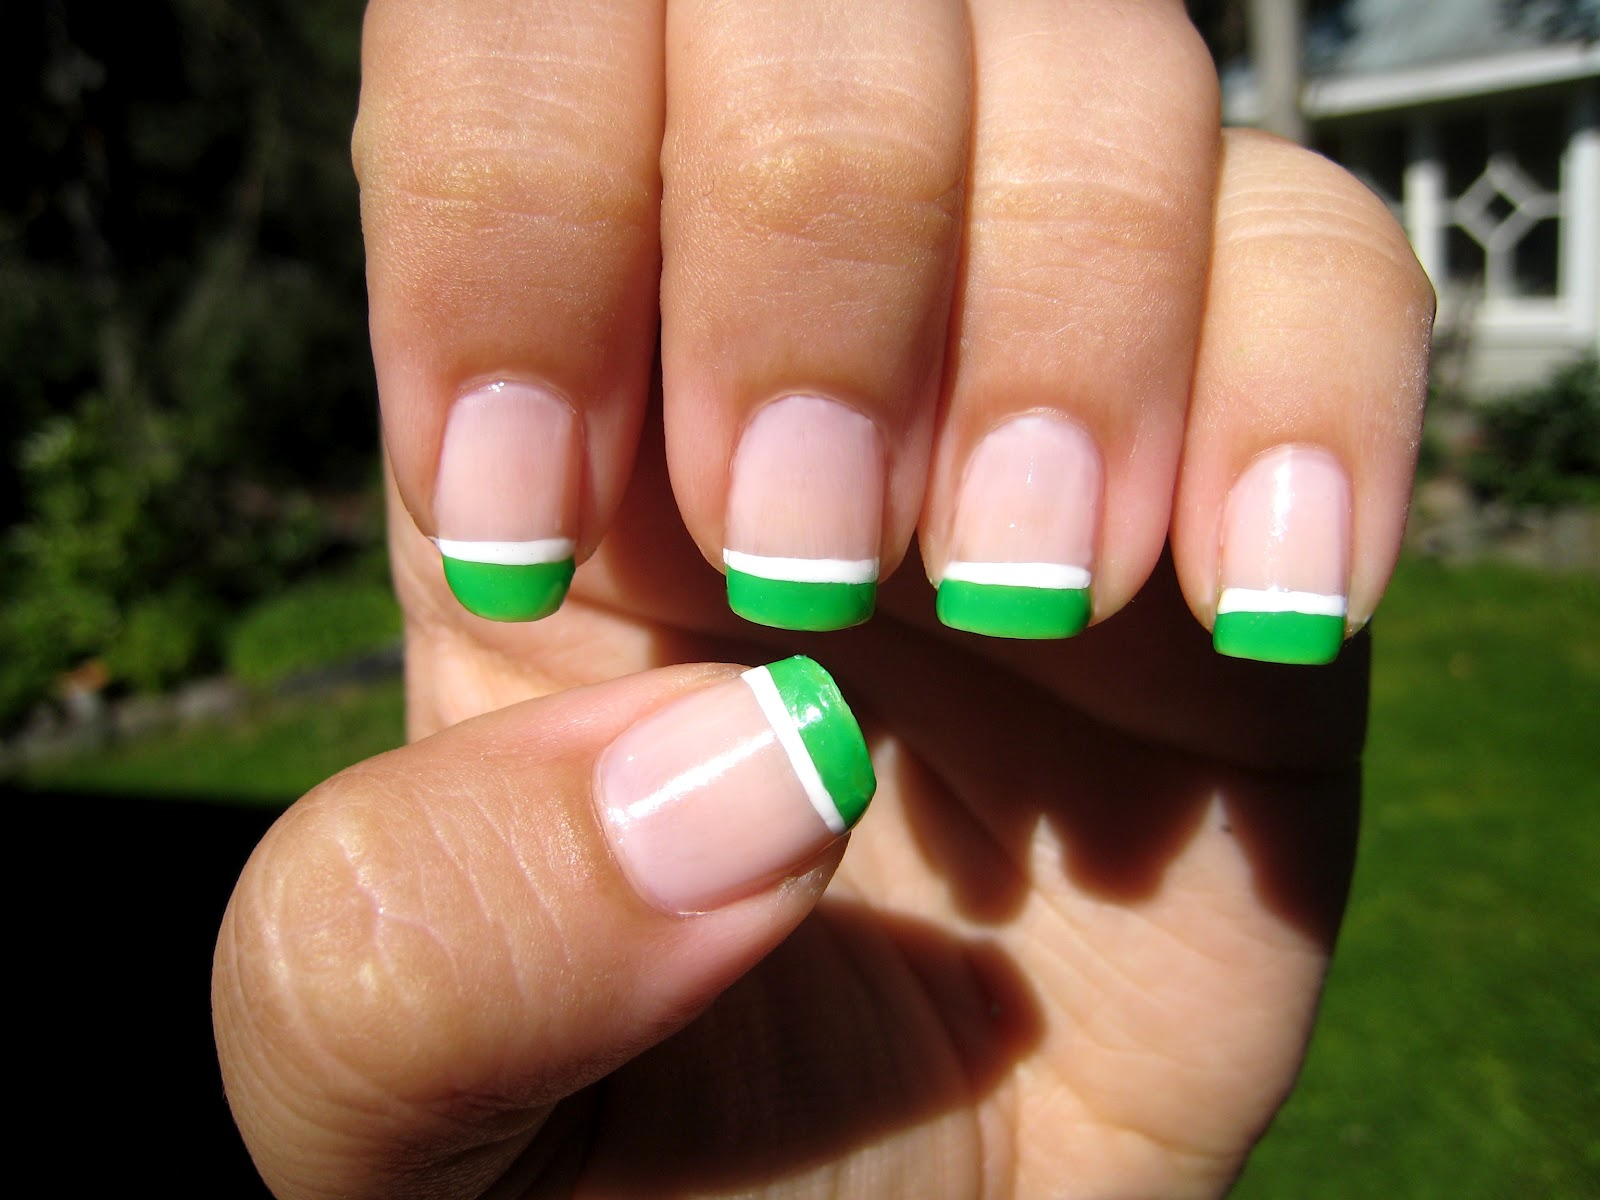 Purple Polish: Neon-Green French Manicure